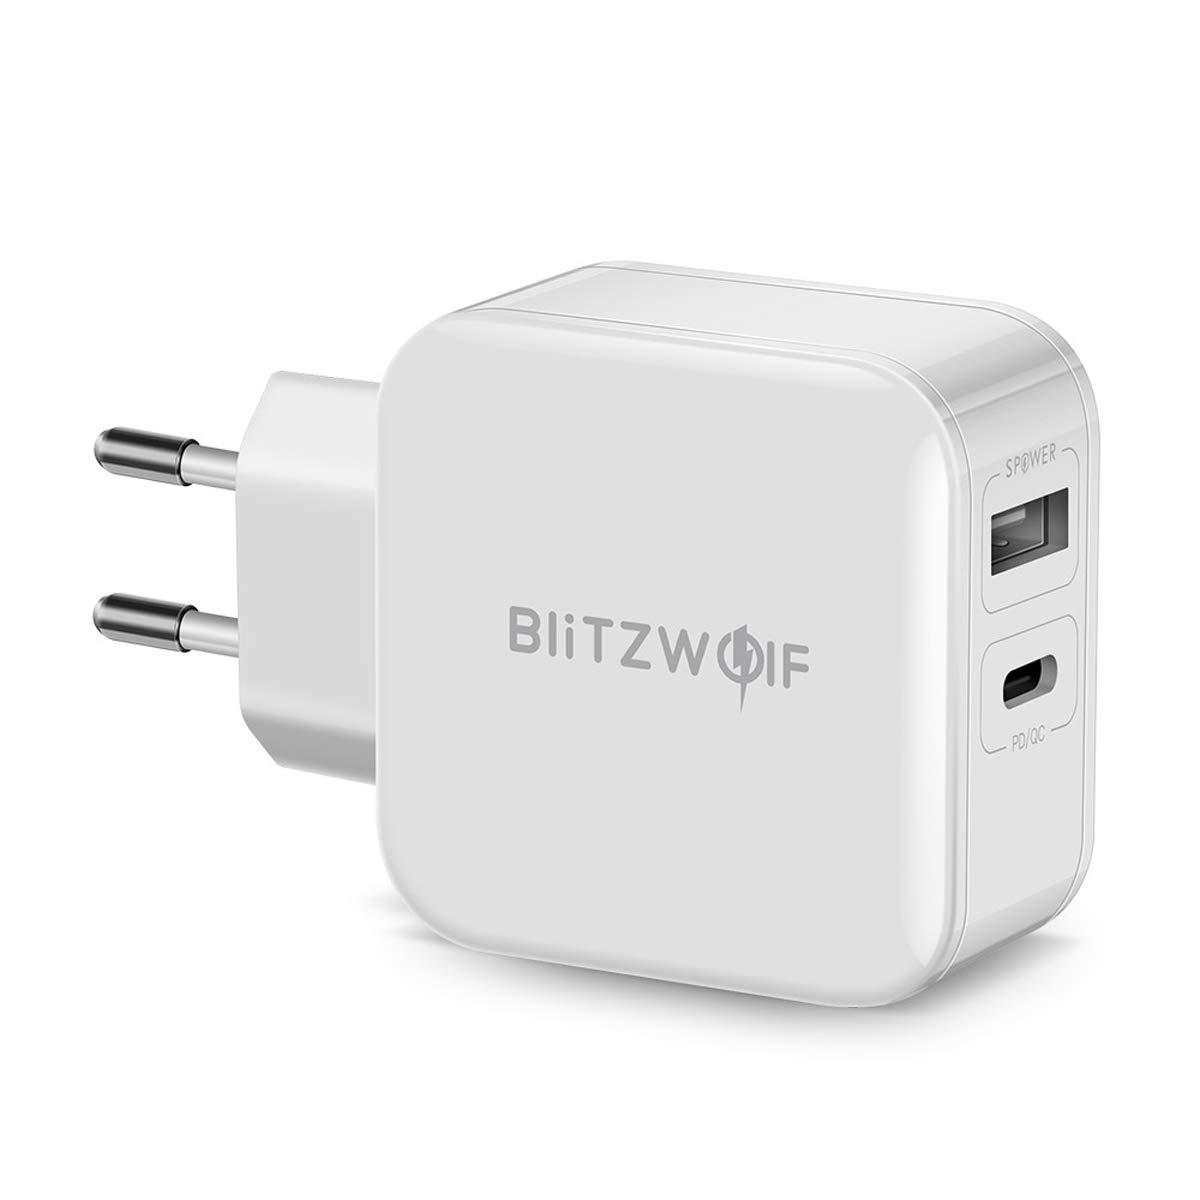 BlitzWolf 30W 2-Port USB C Ladegerät mit Power Delivery